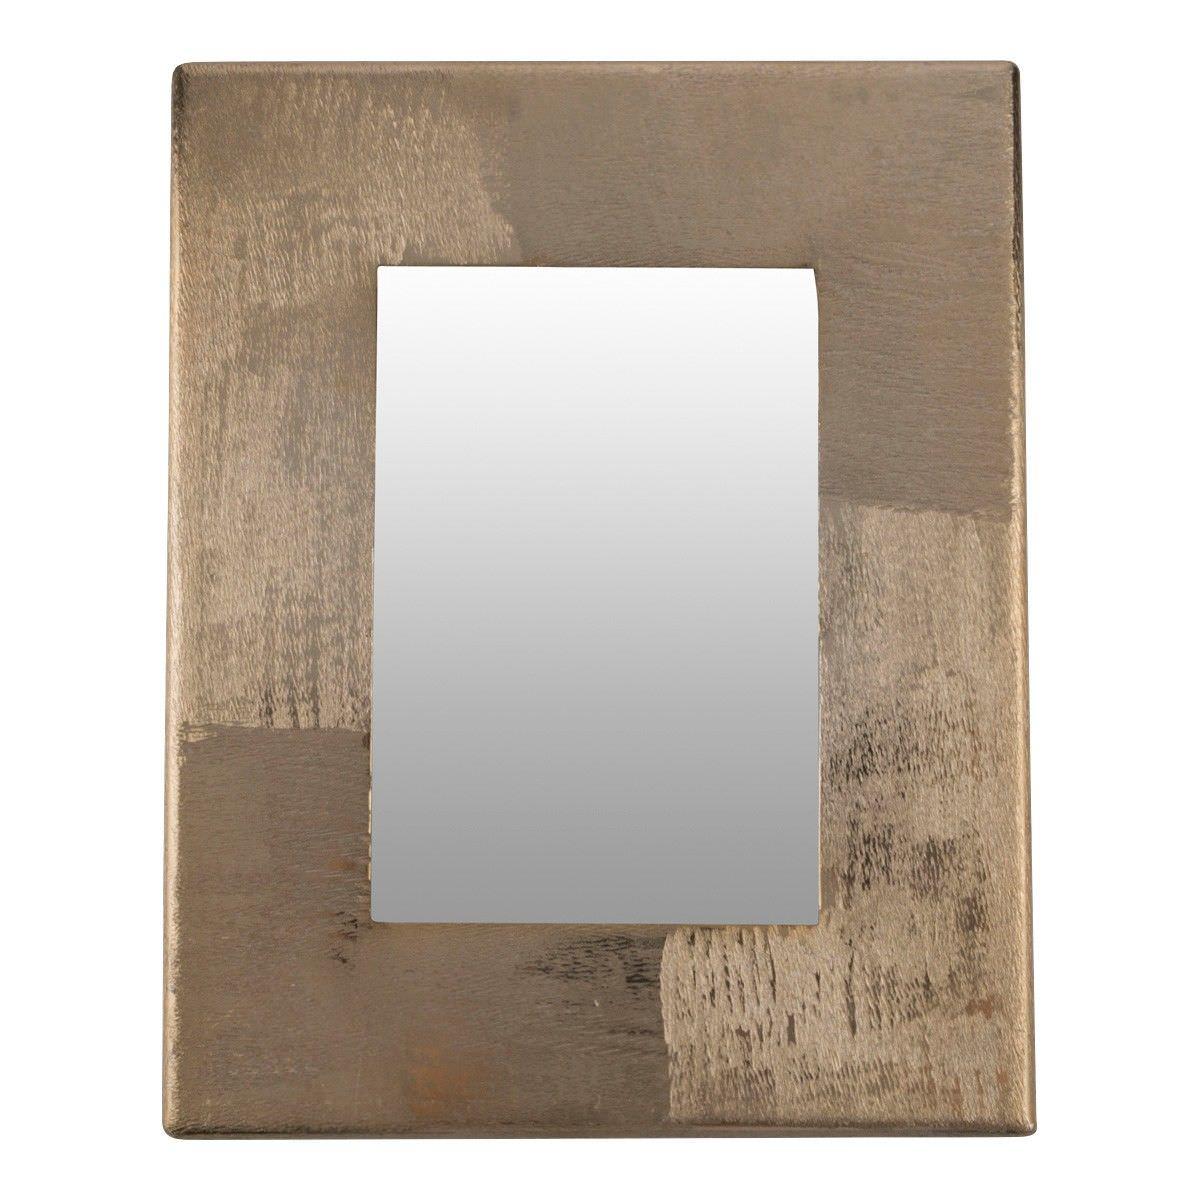 "Bromley Aluminium Photo Frame, 4x6"", Dark Gold"